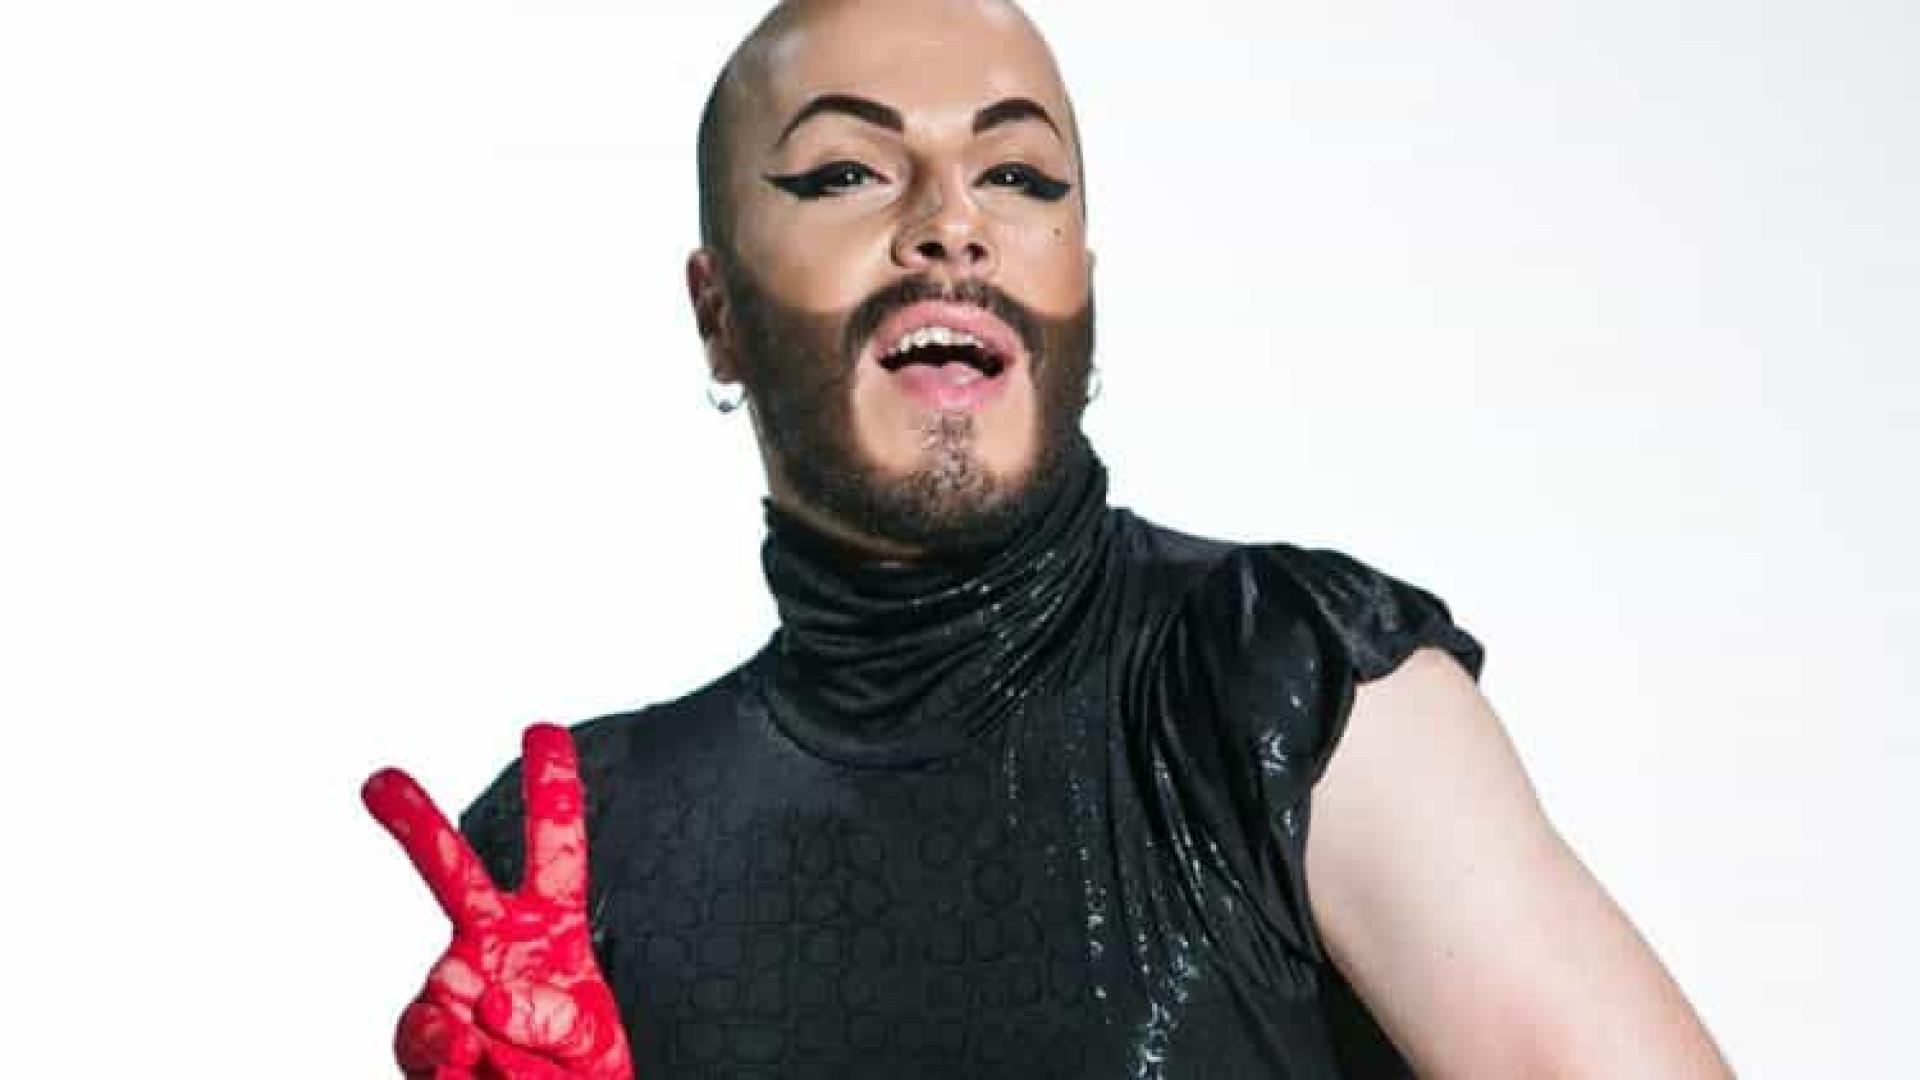 Morre drag queen Natasha Semmynova, ex 'The Voice' Portugal